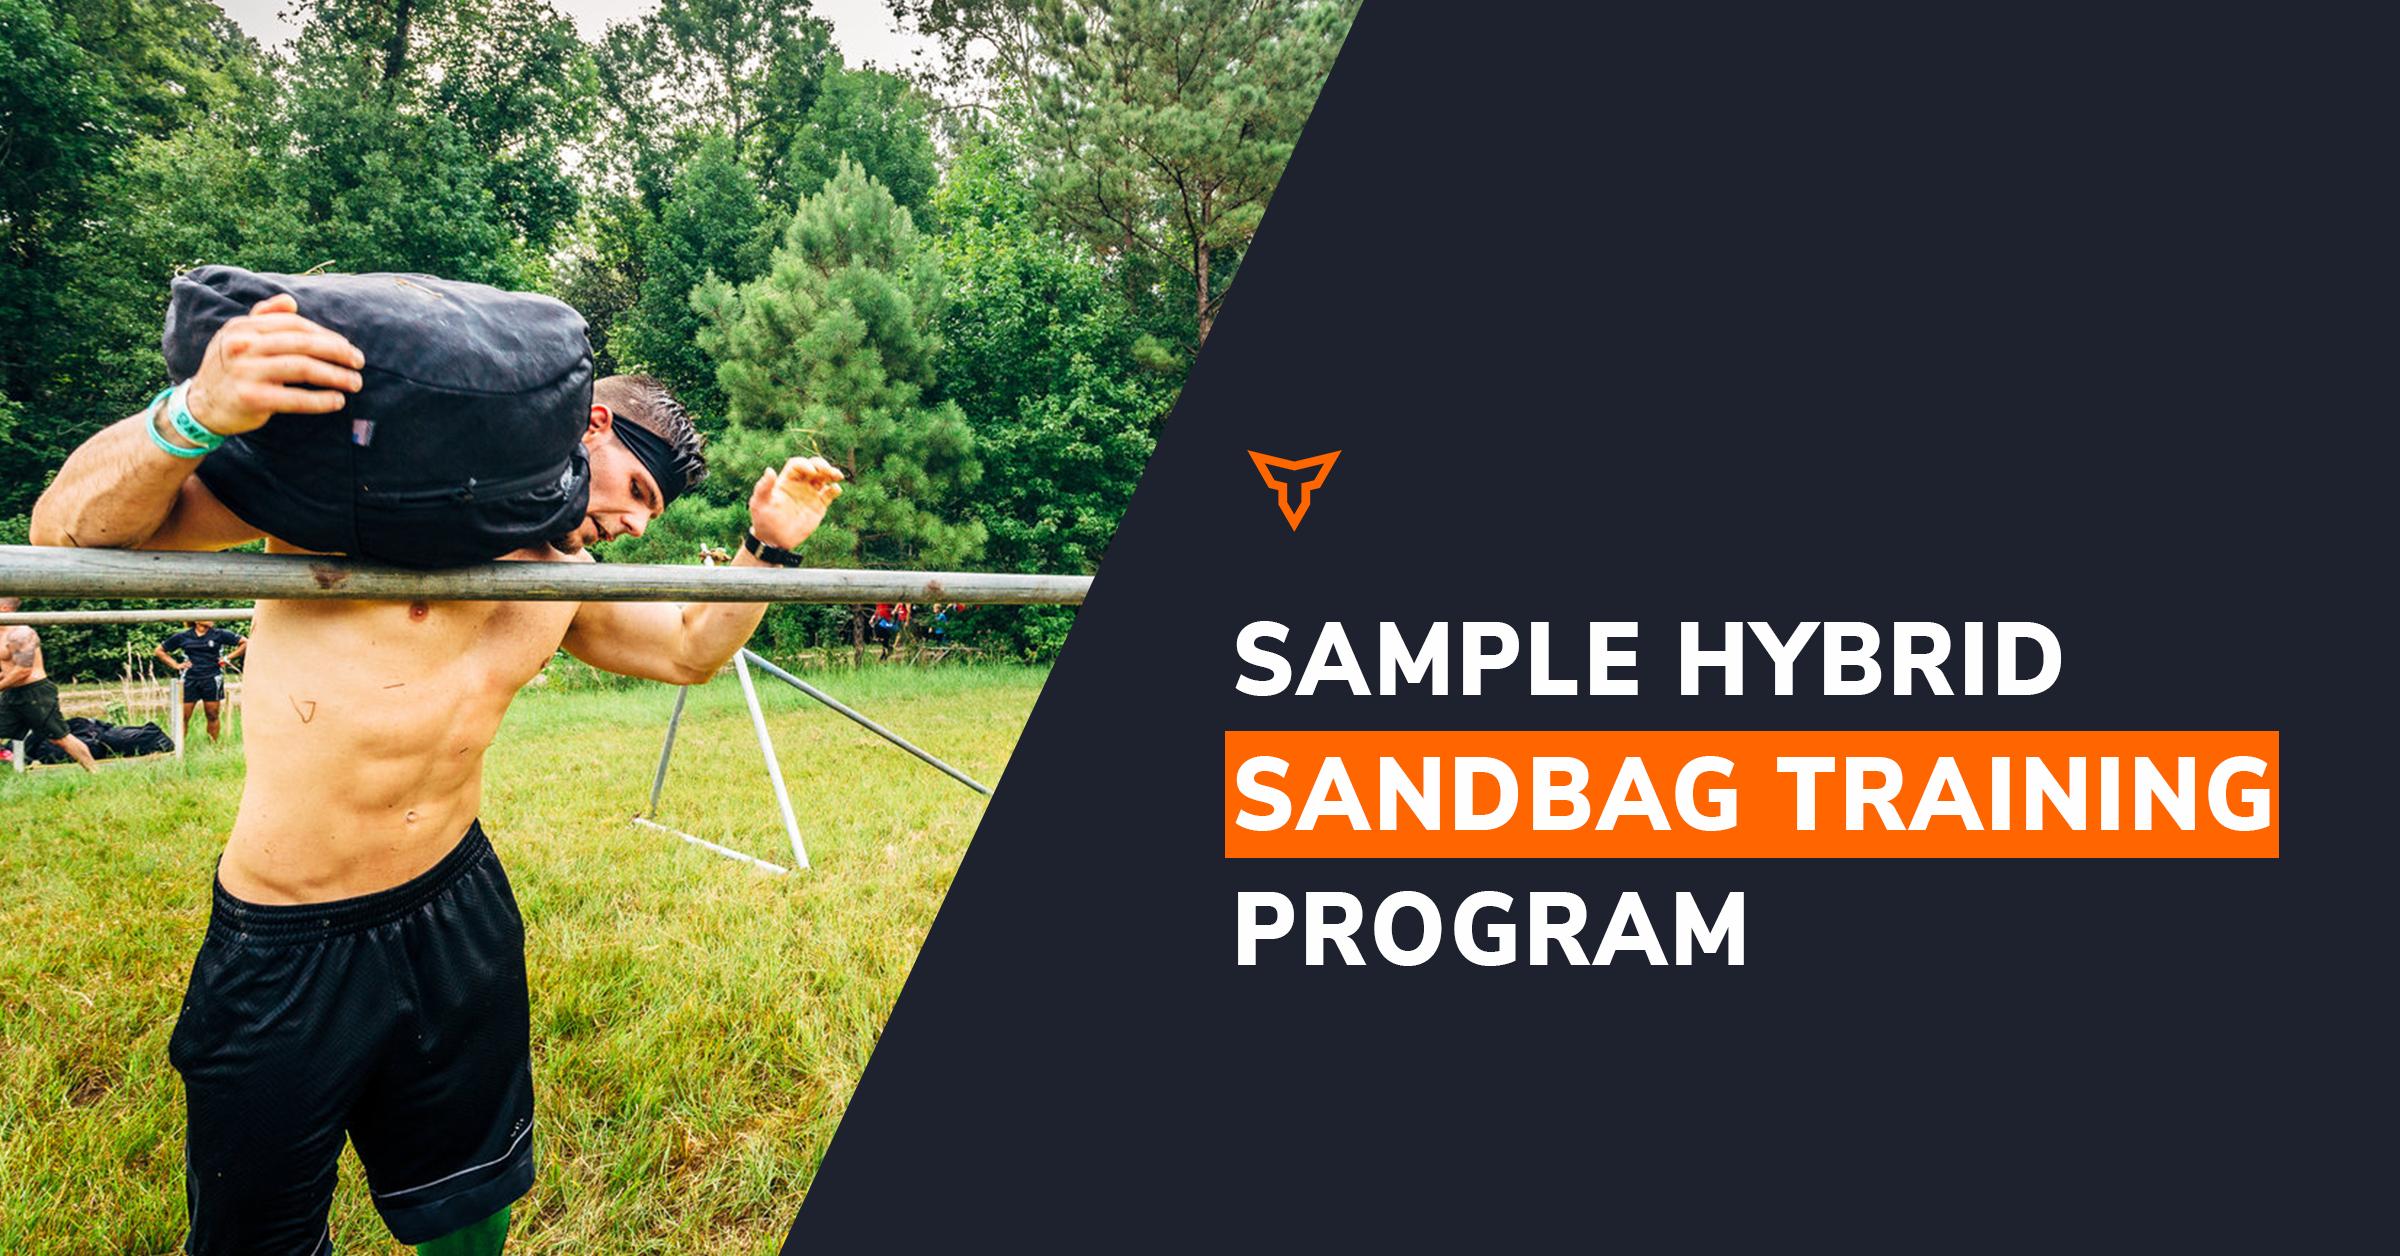 eBook sandbag training card image